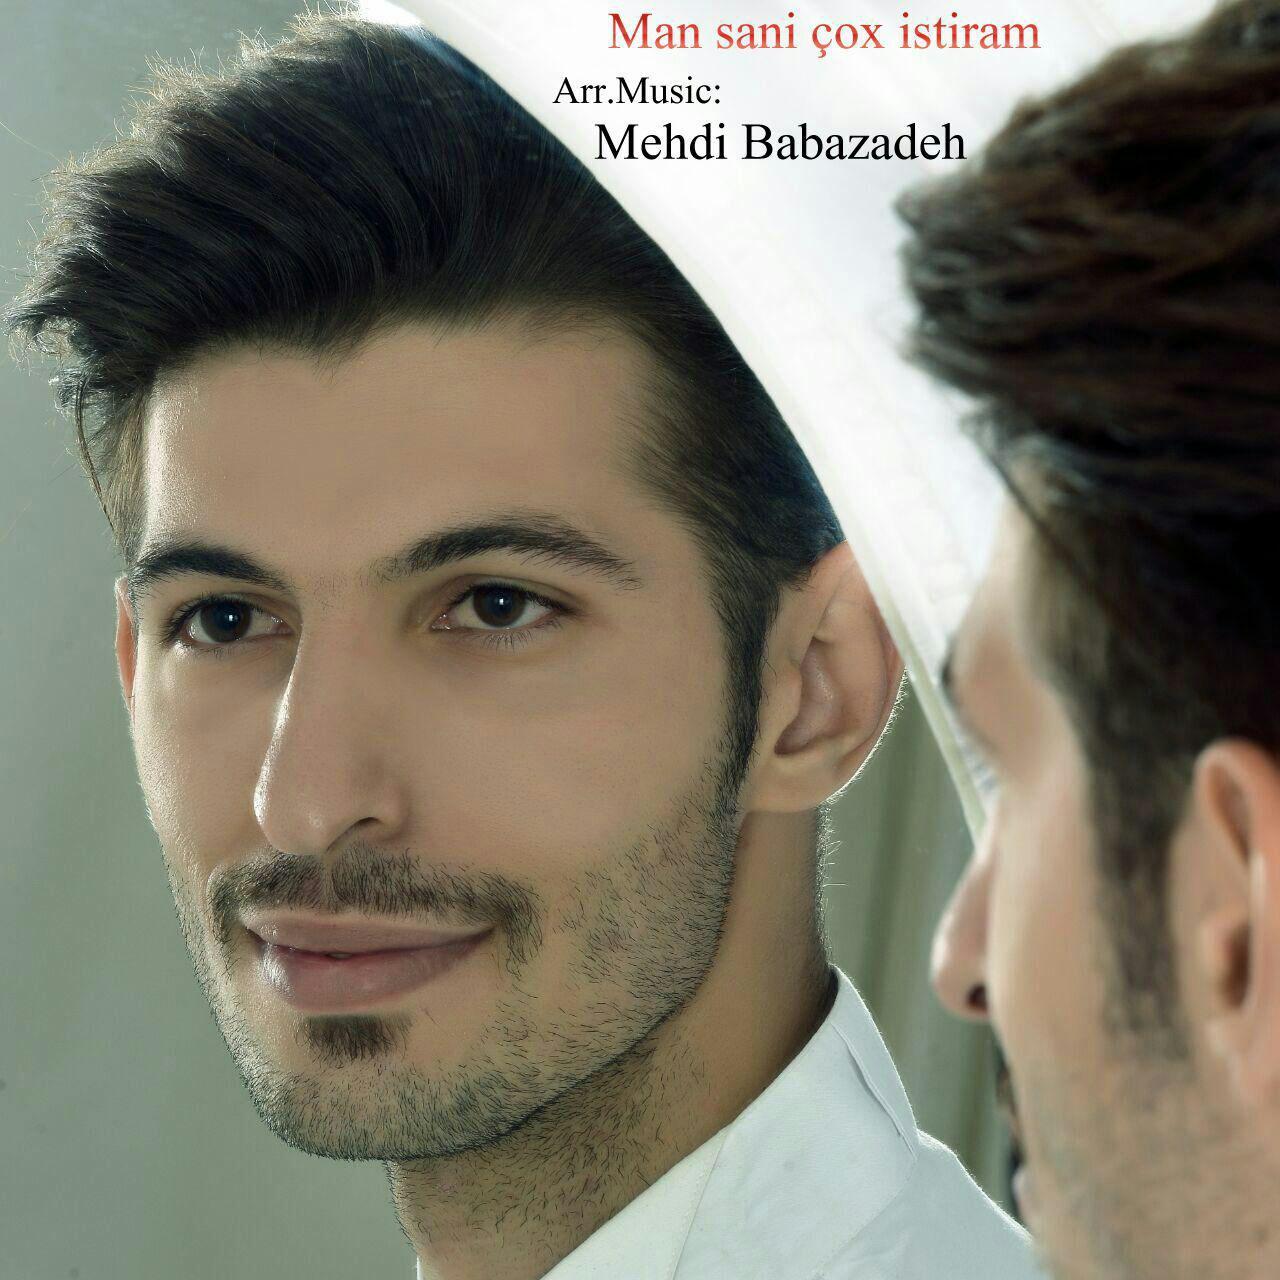 http://s9.picofile.com/file/8301045226/052Mehdi_Babazadeh_Man_Sani_Cox_Istiram.jpg